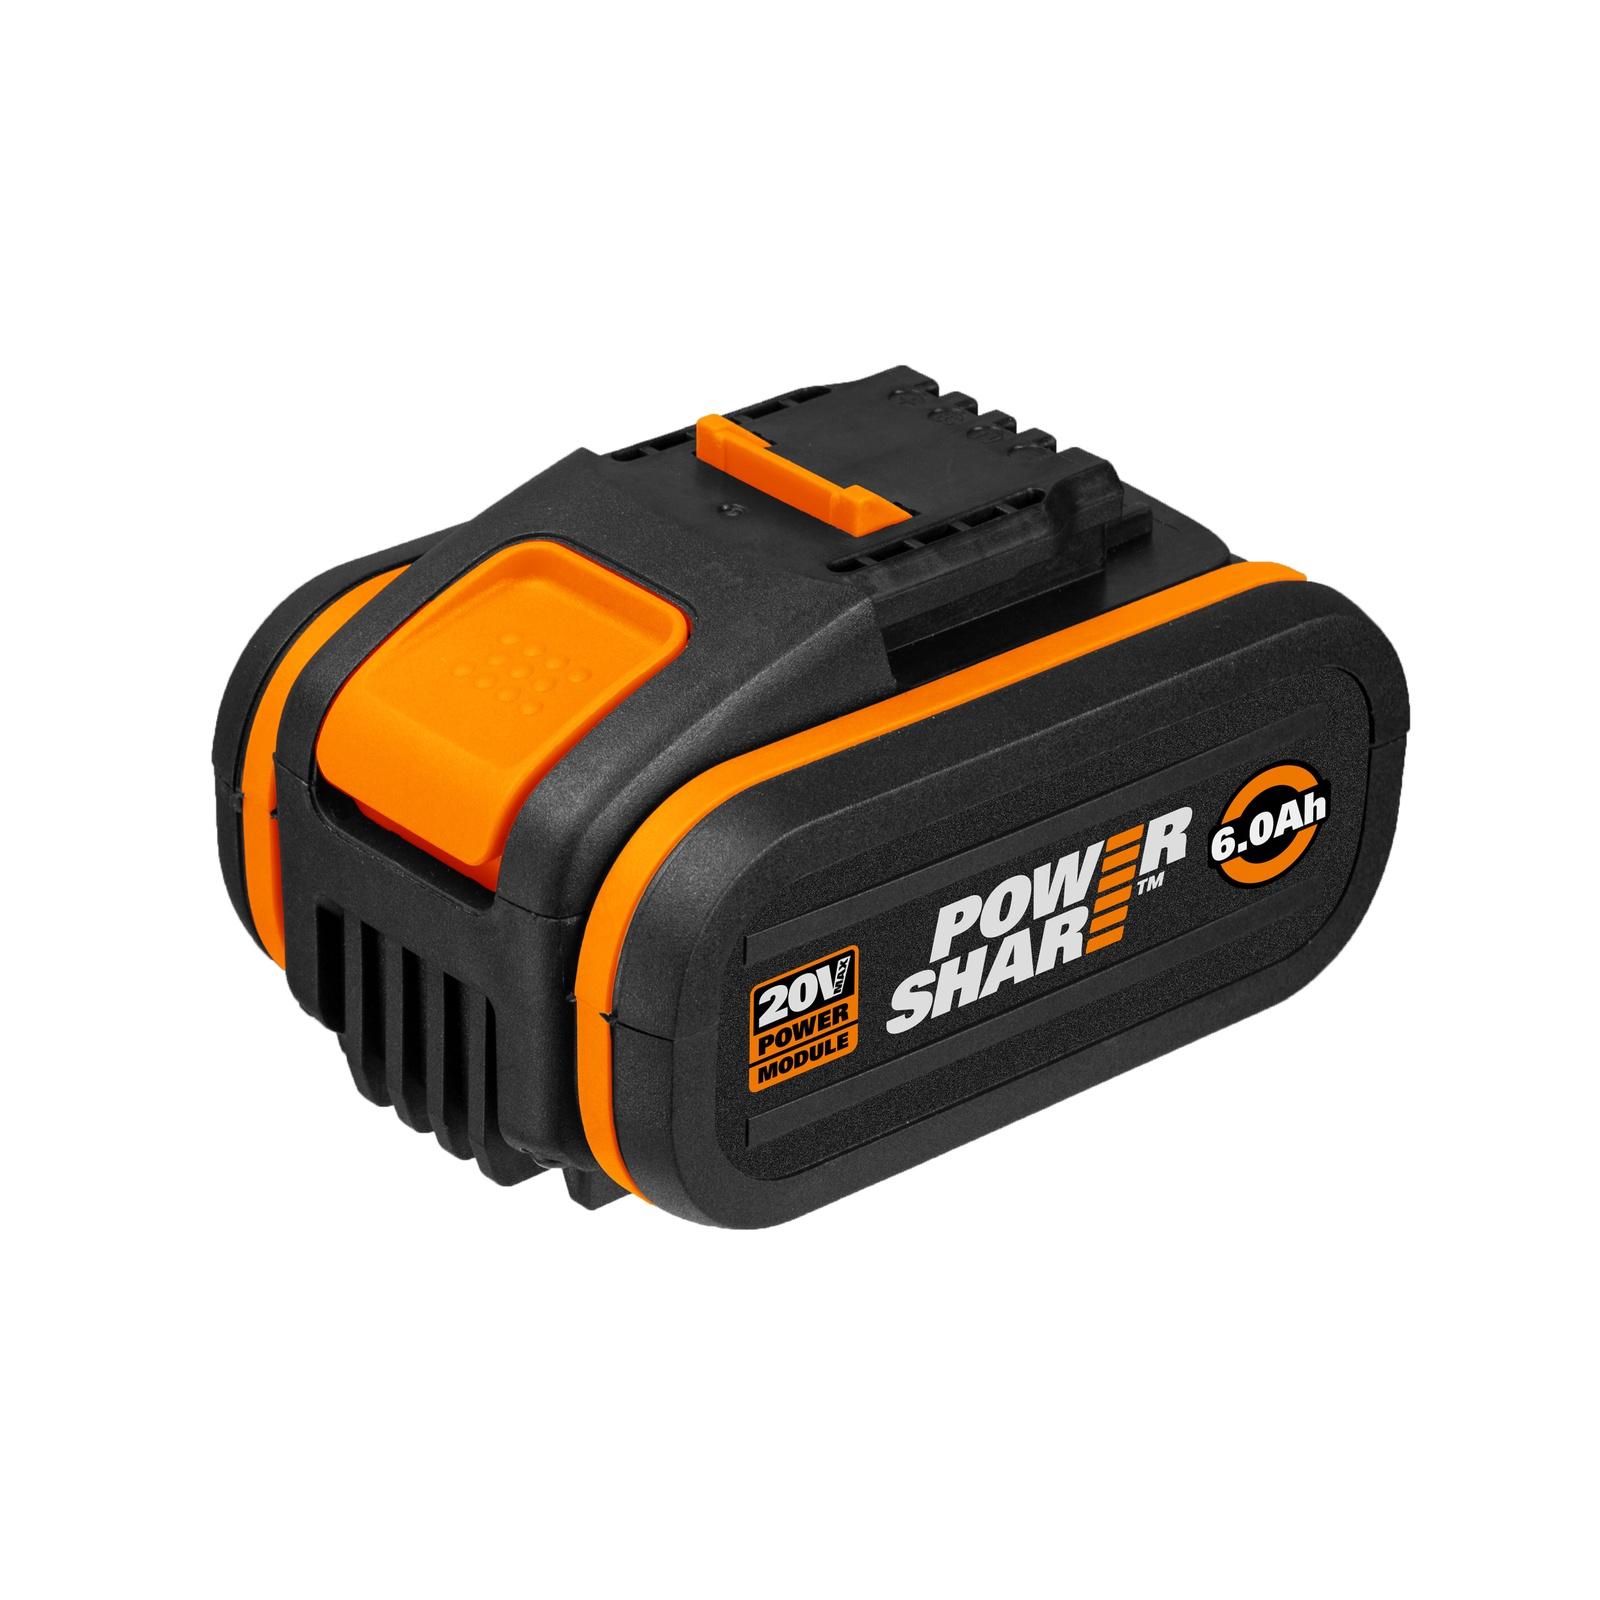 Аккумулятор для инструмента WORX WA3641 аккумуляторы для автомобиля 65 а ч цена братск